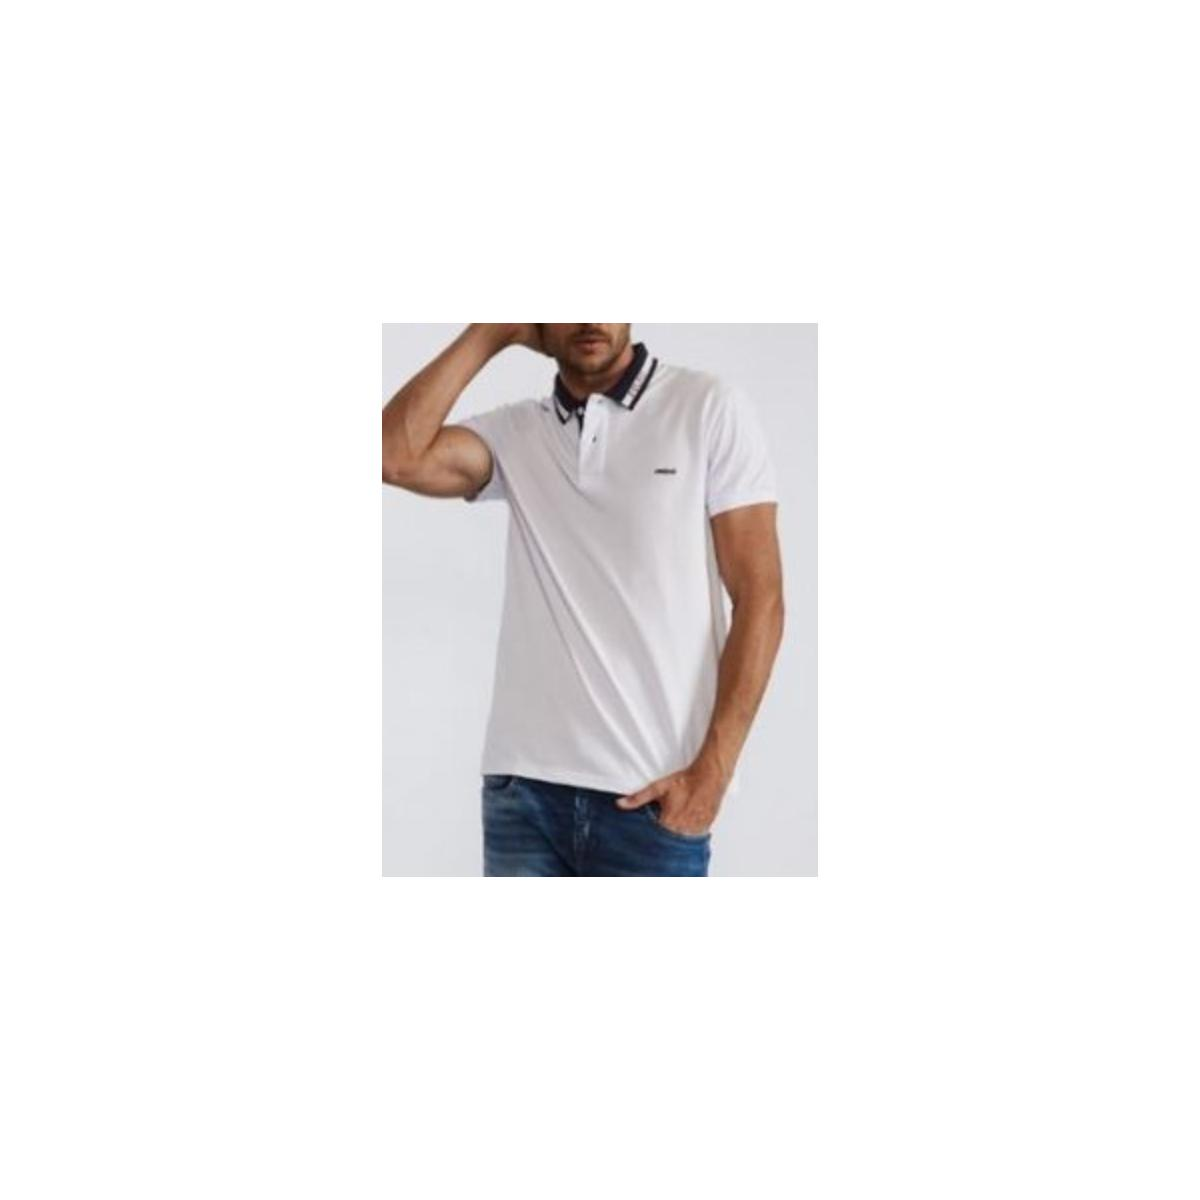 Camiseta Masculina Colcci 250102562 001 Branco